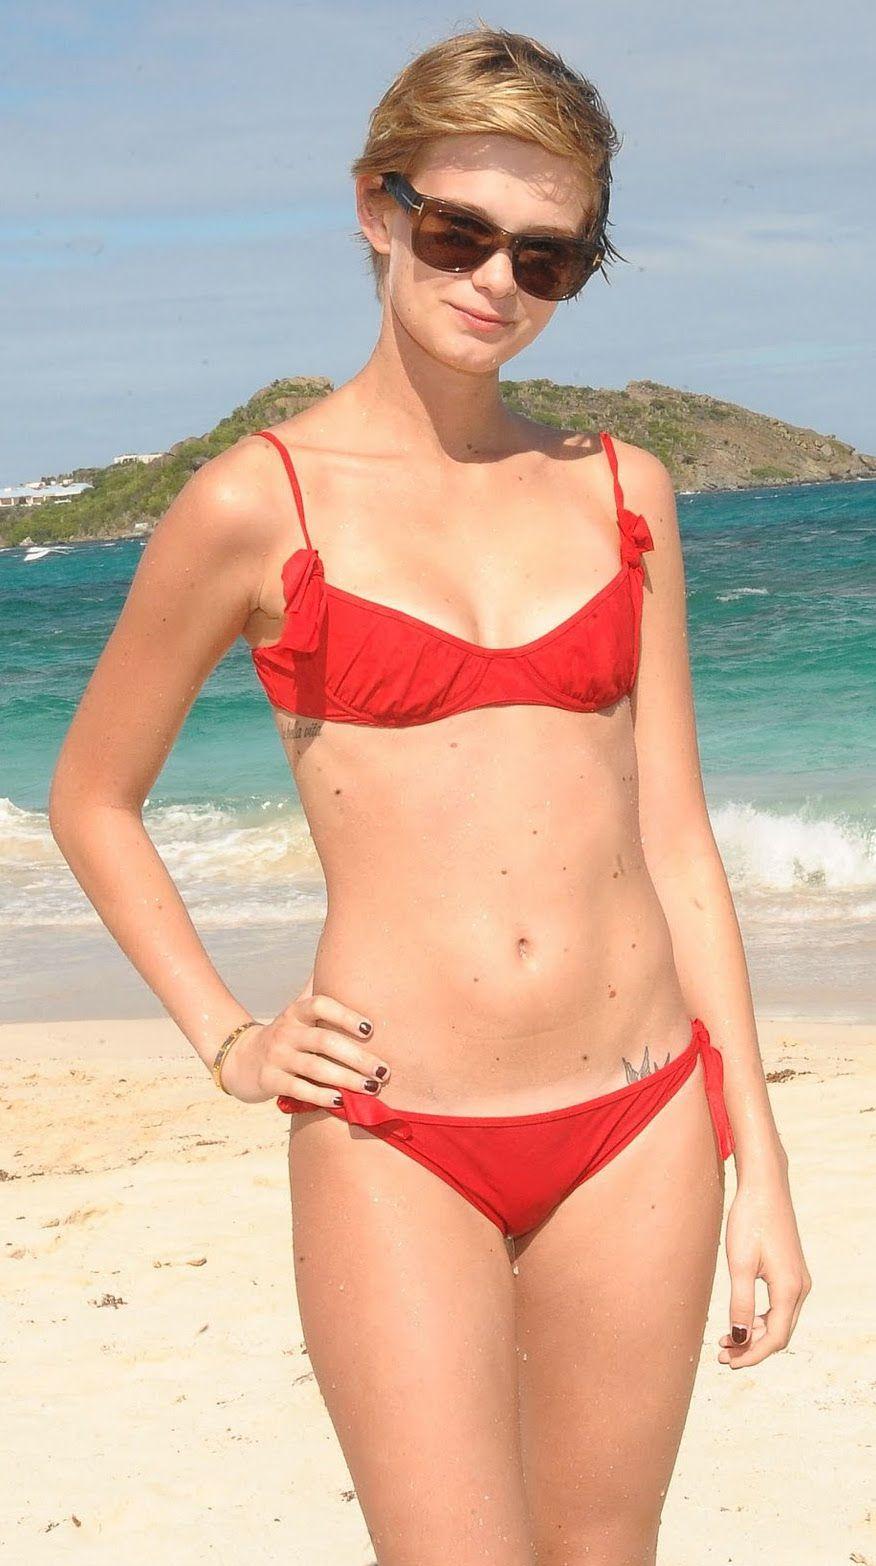 Sara paxton bikini pics